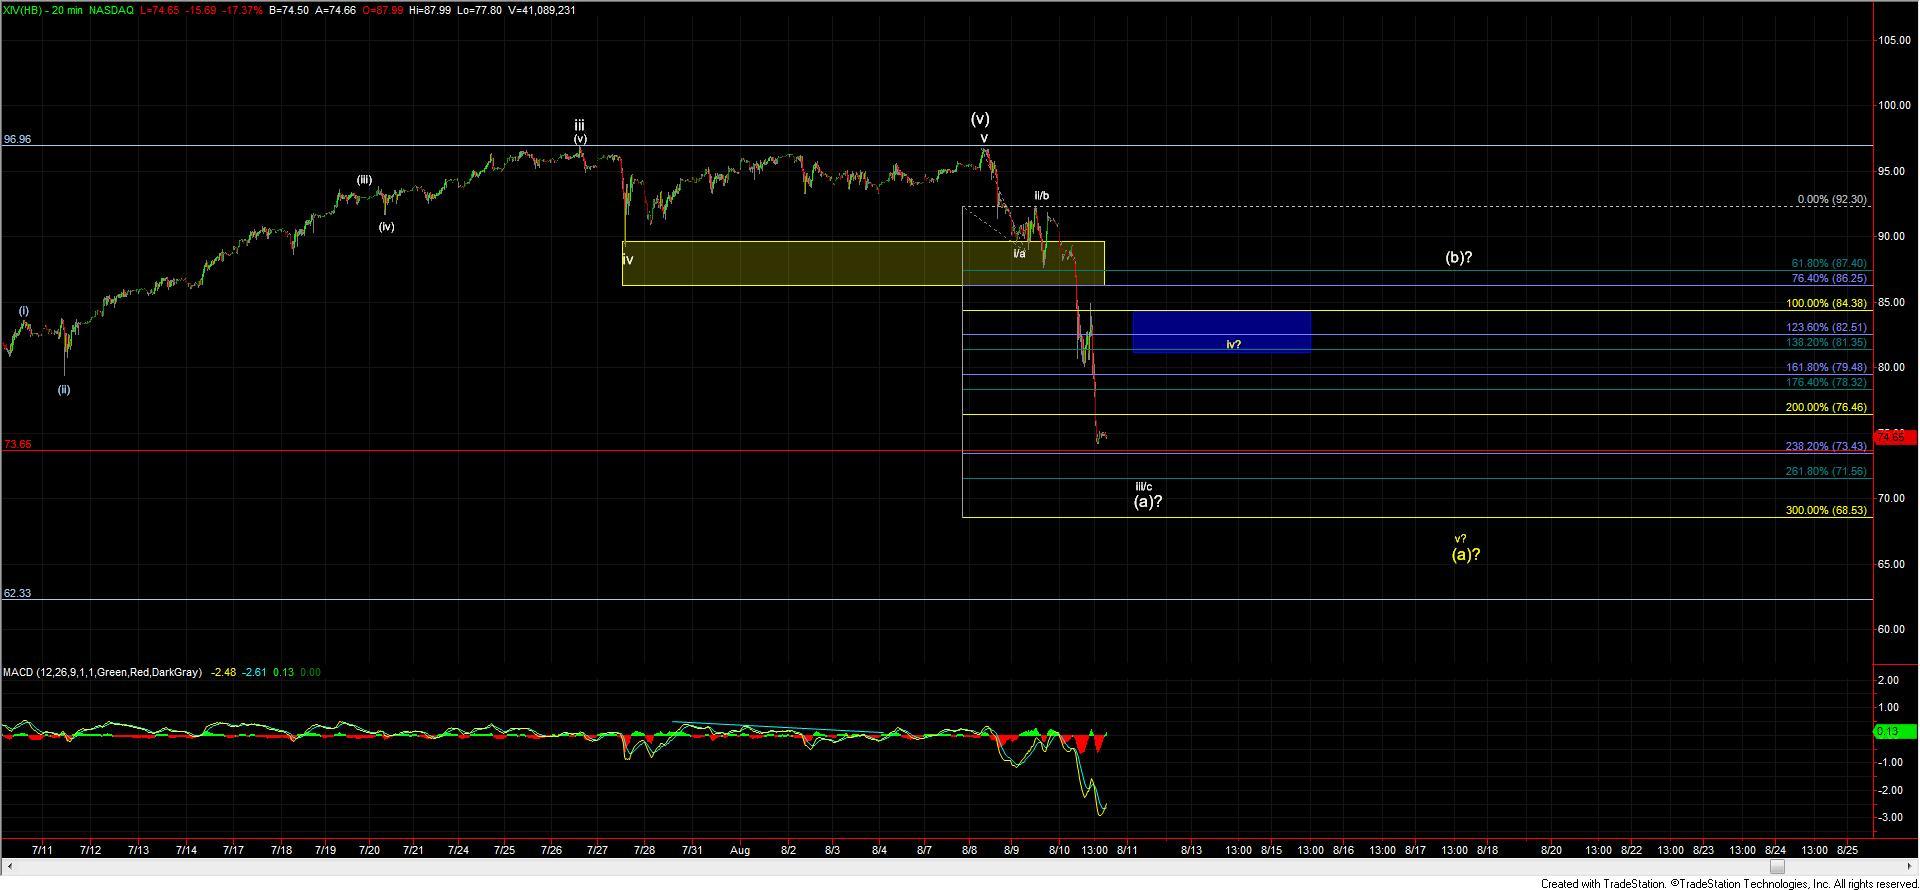 XIV 20 Min Chart